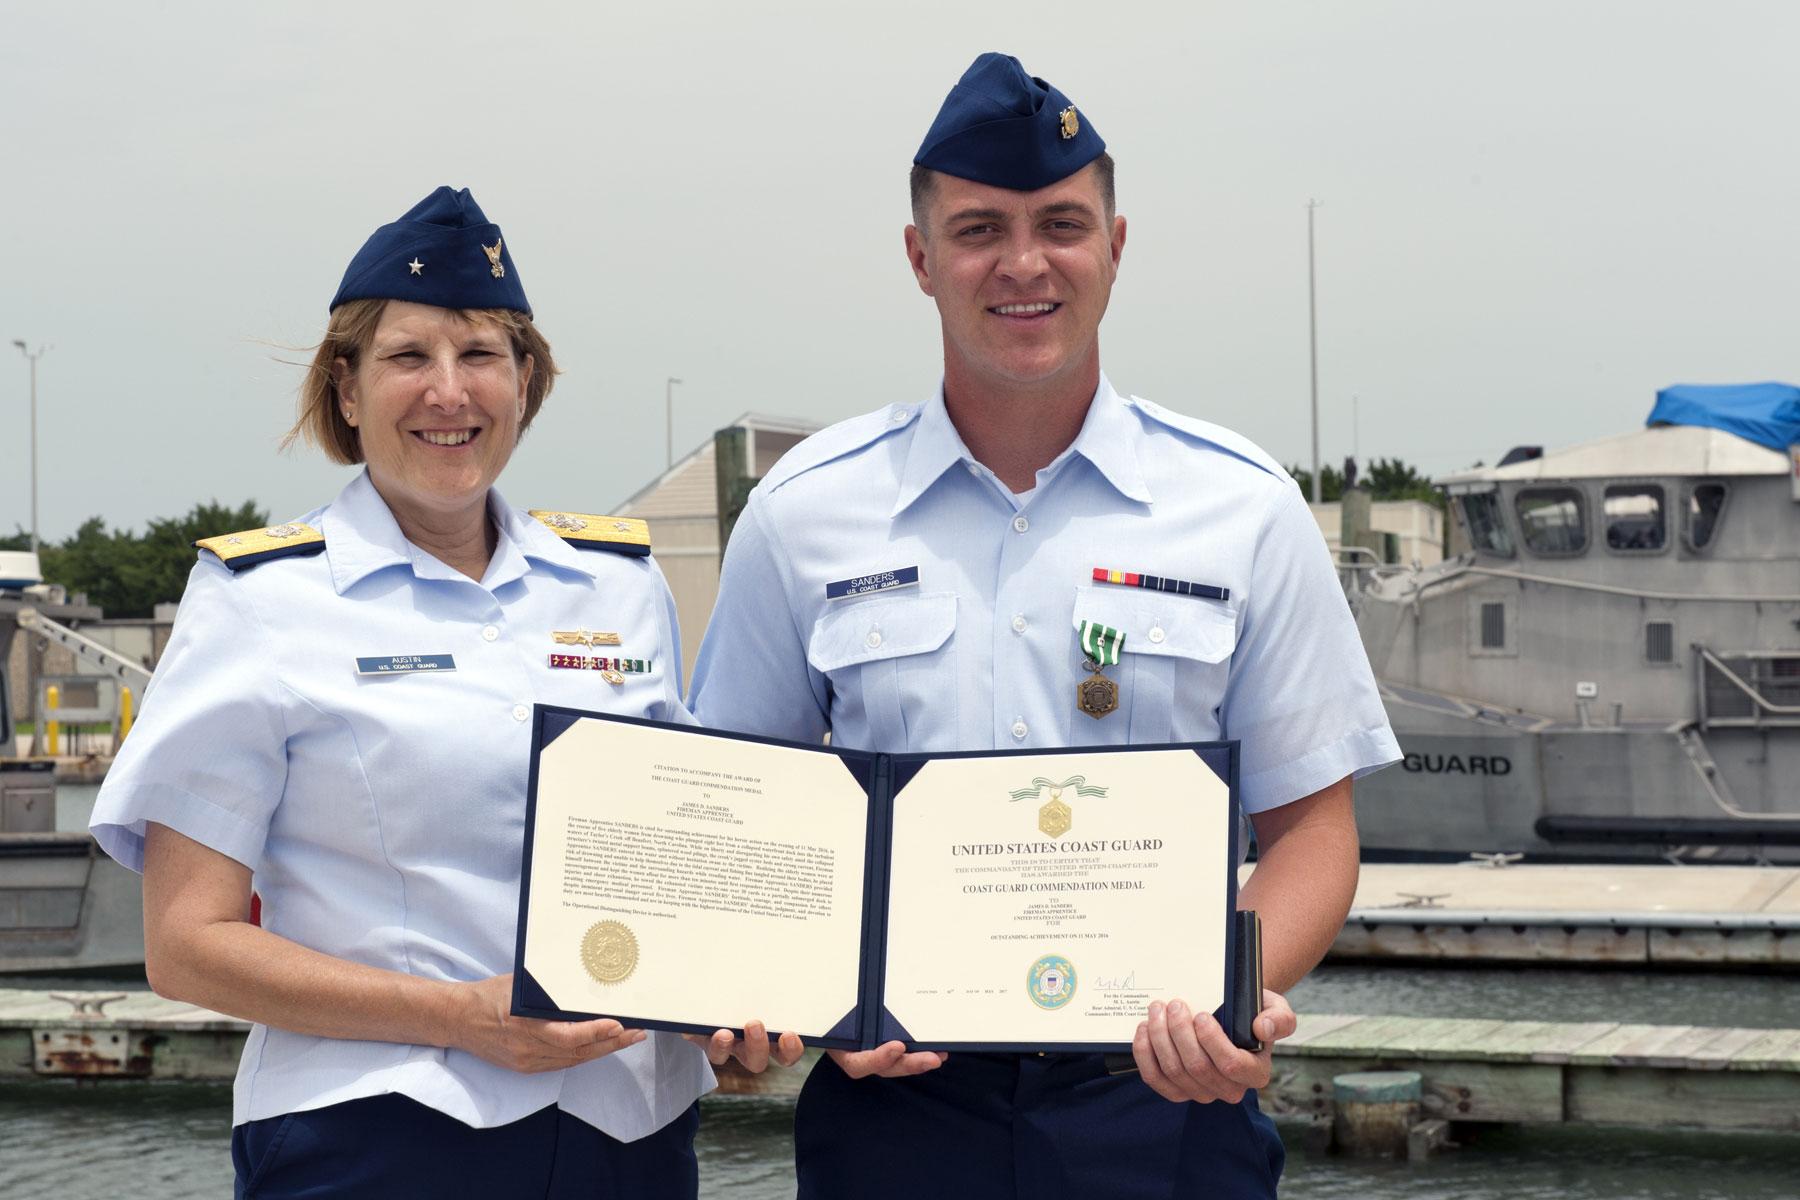 Coast Guardsman Receives Award For Rescuing Women In Pier